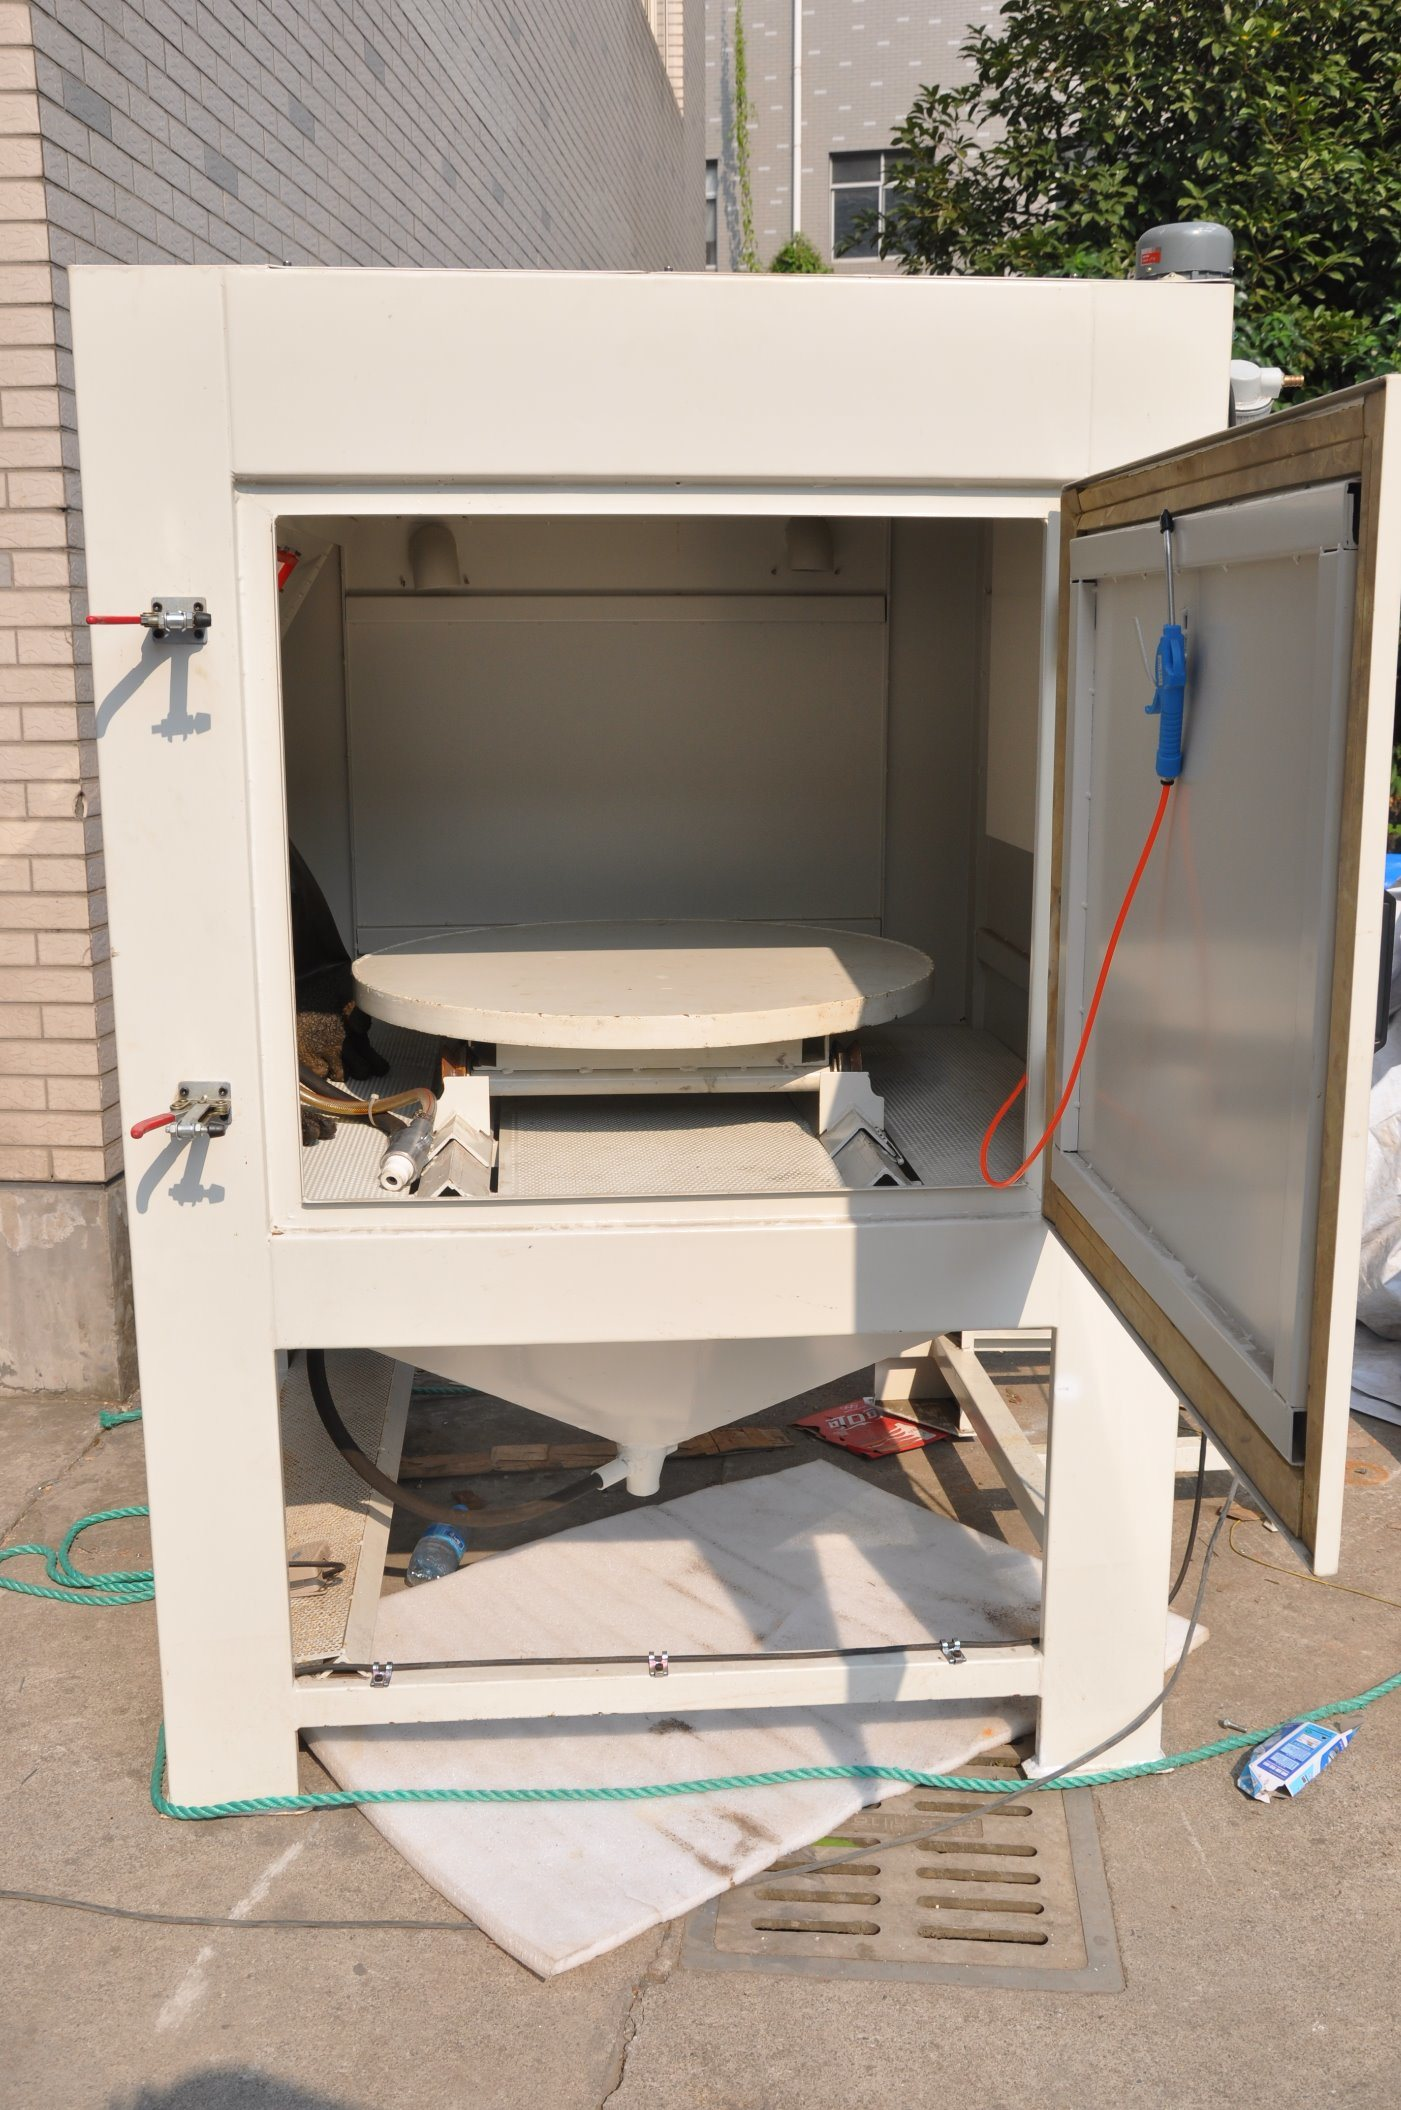 itm media bead abrasive sand blaster glass blasting blast cabinet air